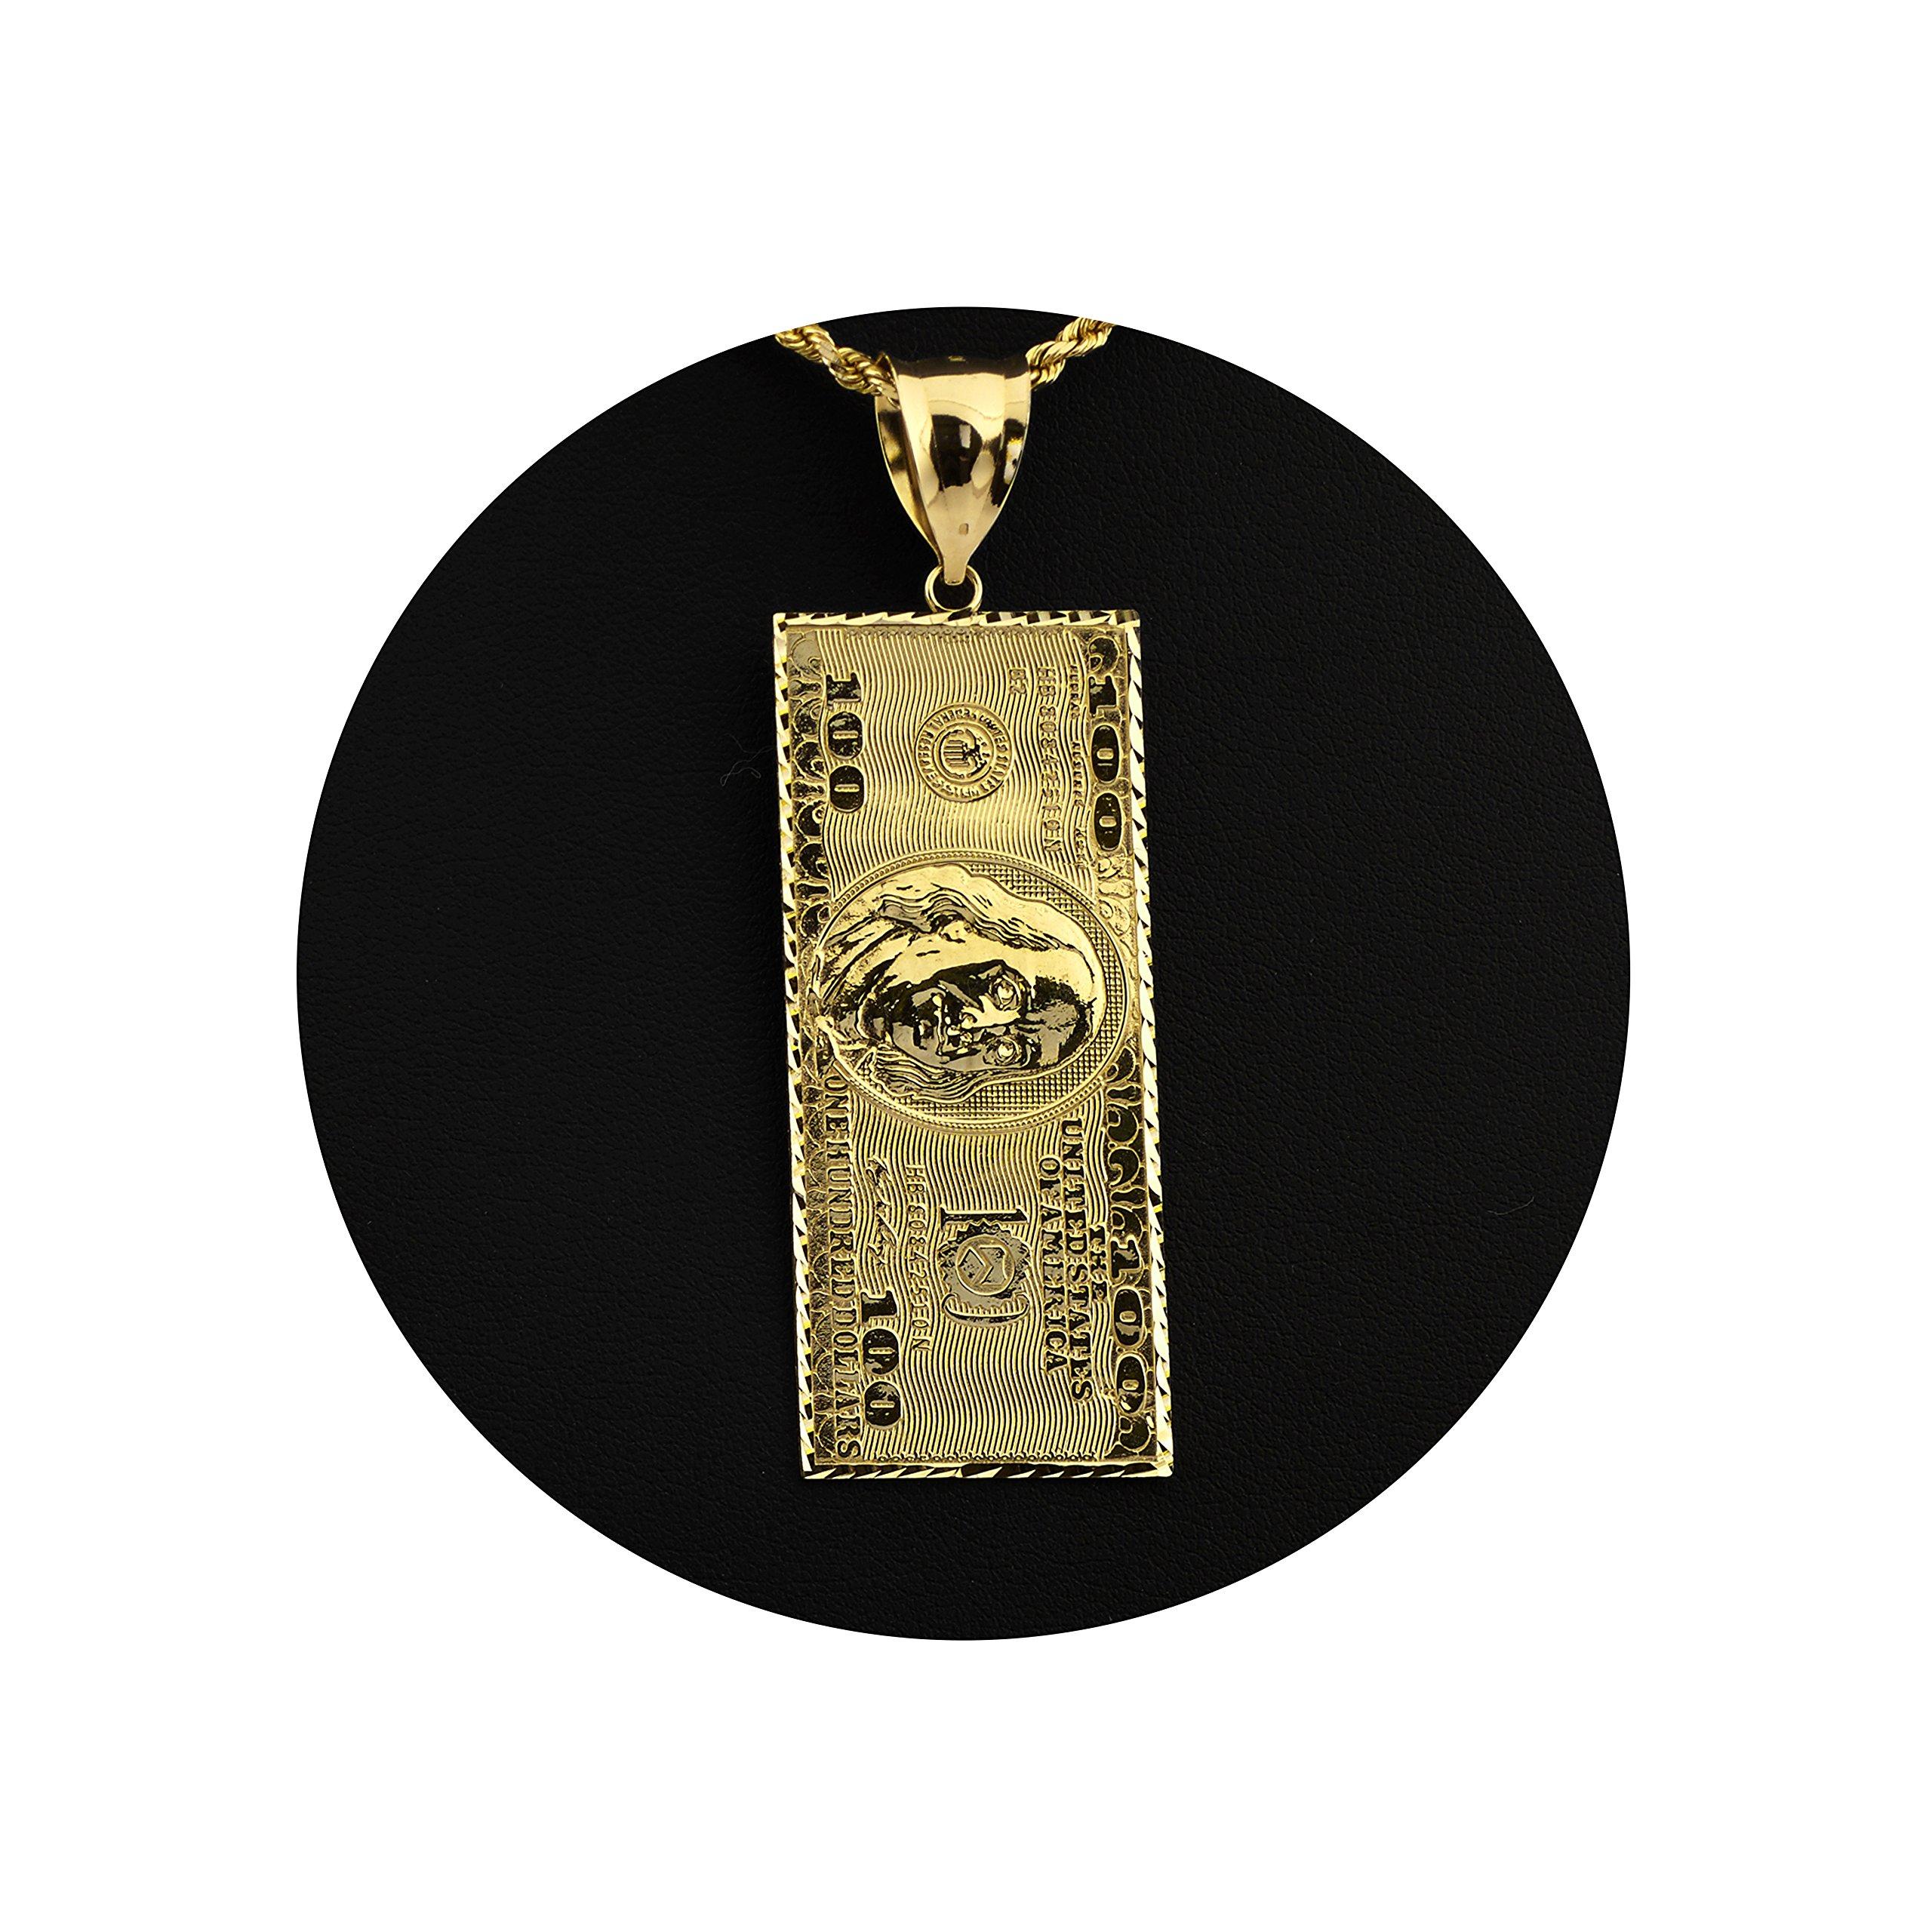 LoveBling 10K Yellow Gold Hundred Dollar Bill Diamond Cut Charm Pendant (2.60'' x 0.85'')